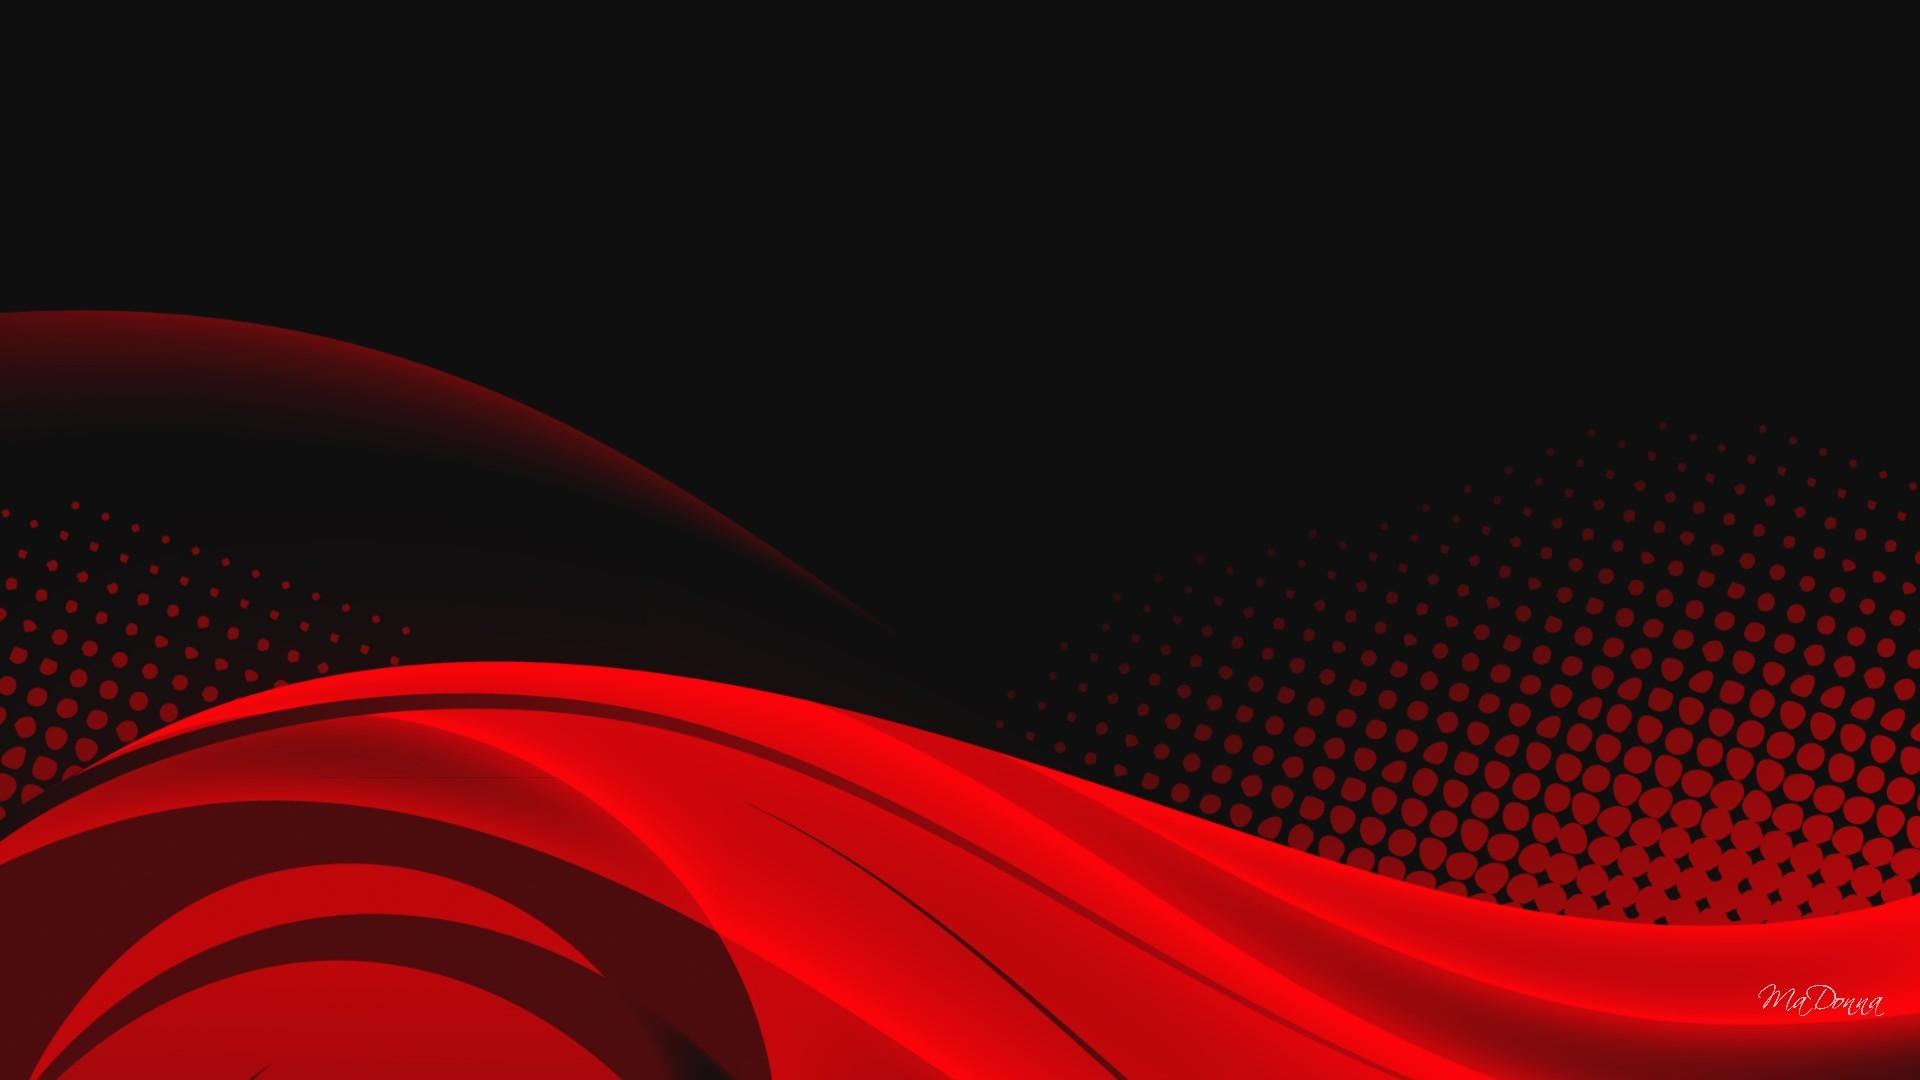 Download 88+ Wallpaper Hitam Merah Paling Keren